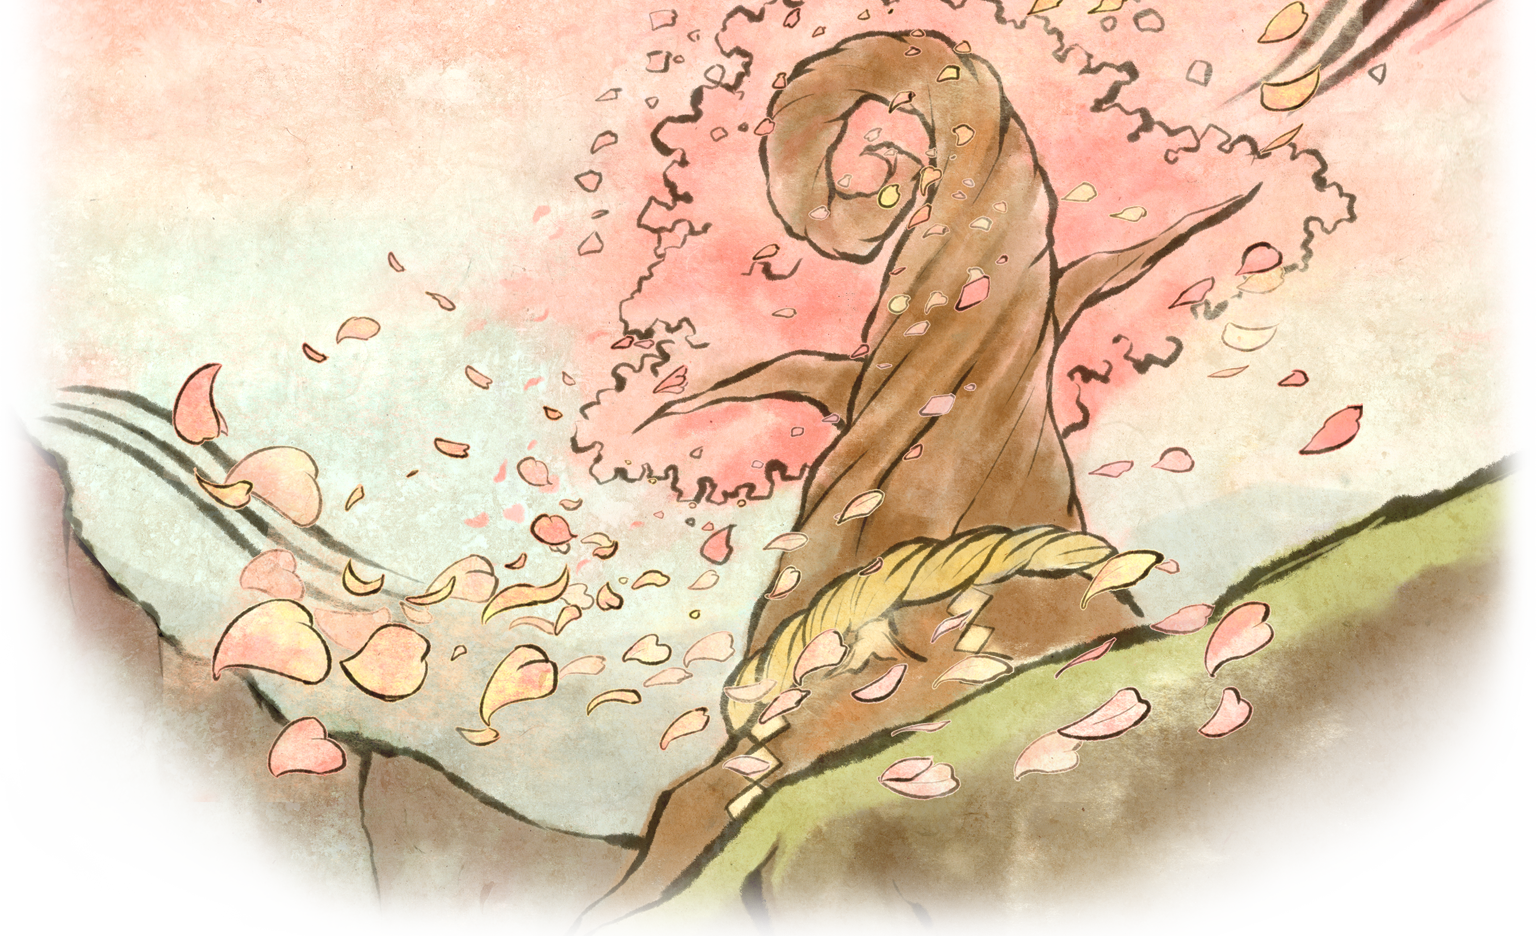 clipart freeuse library okami drawing watercolor #100569478